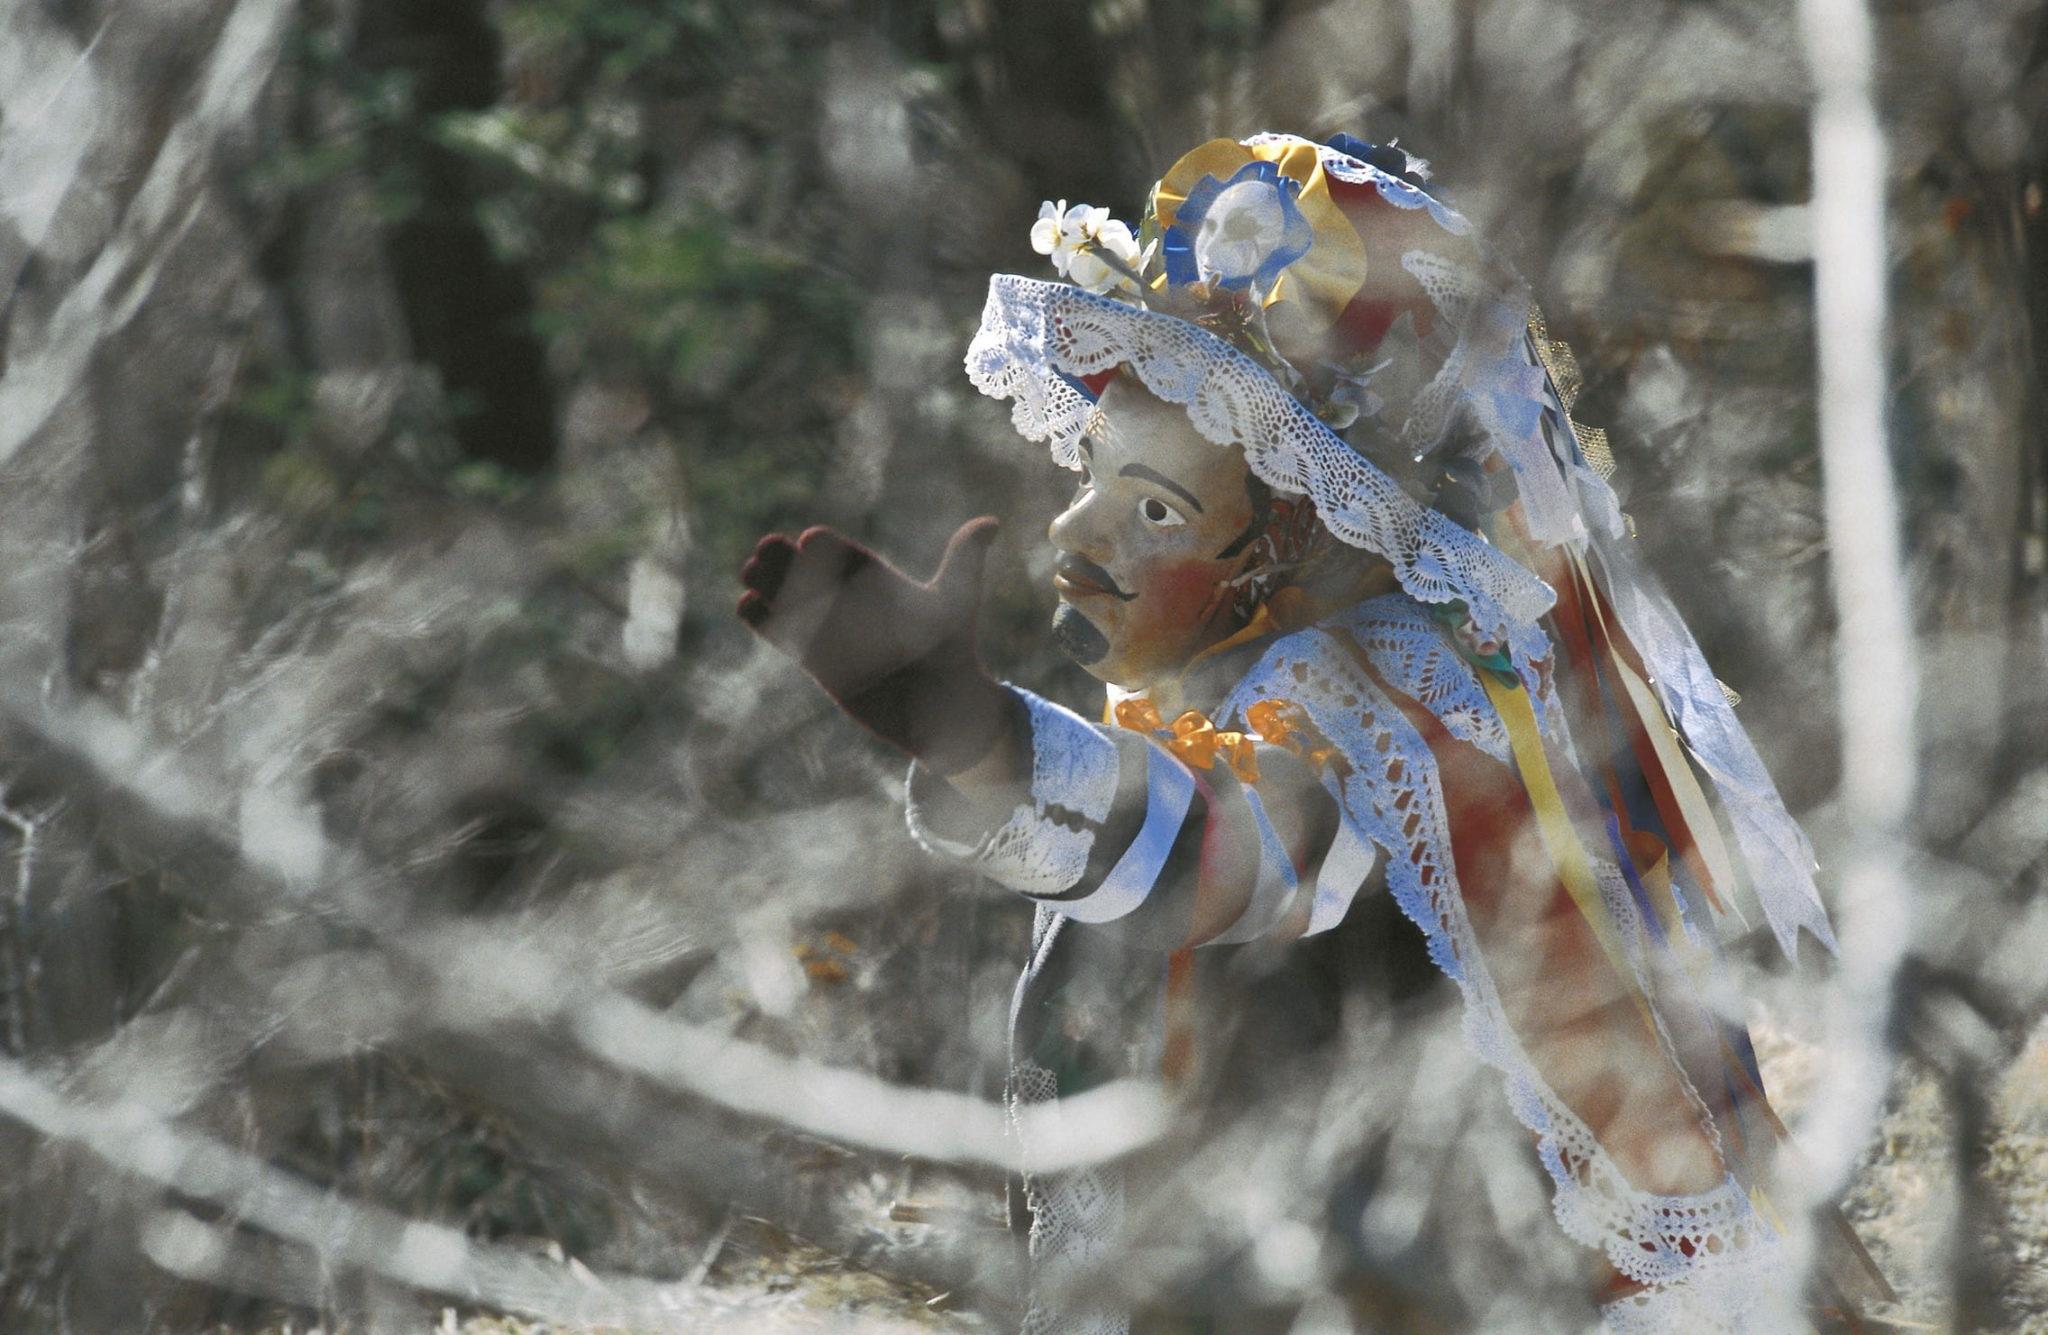 Carnevale Ladino in Trentino - Foto Pierluigi Orler